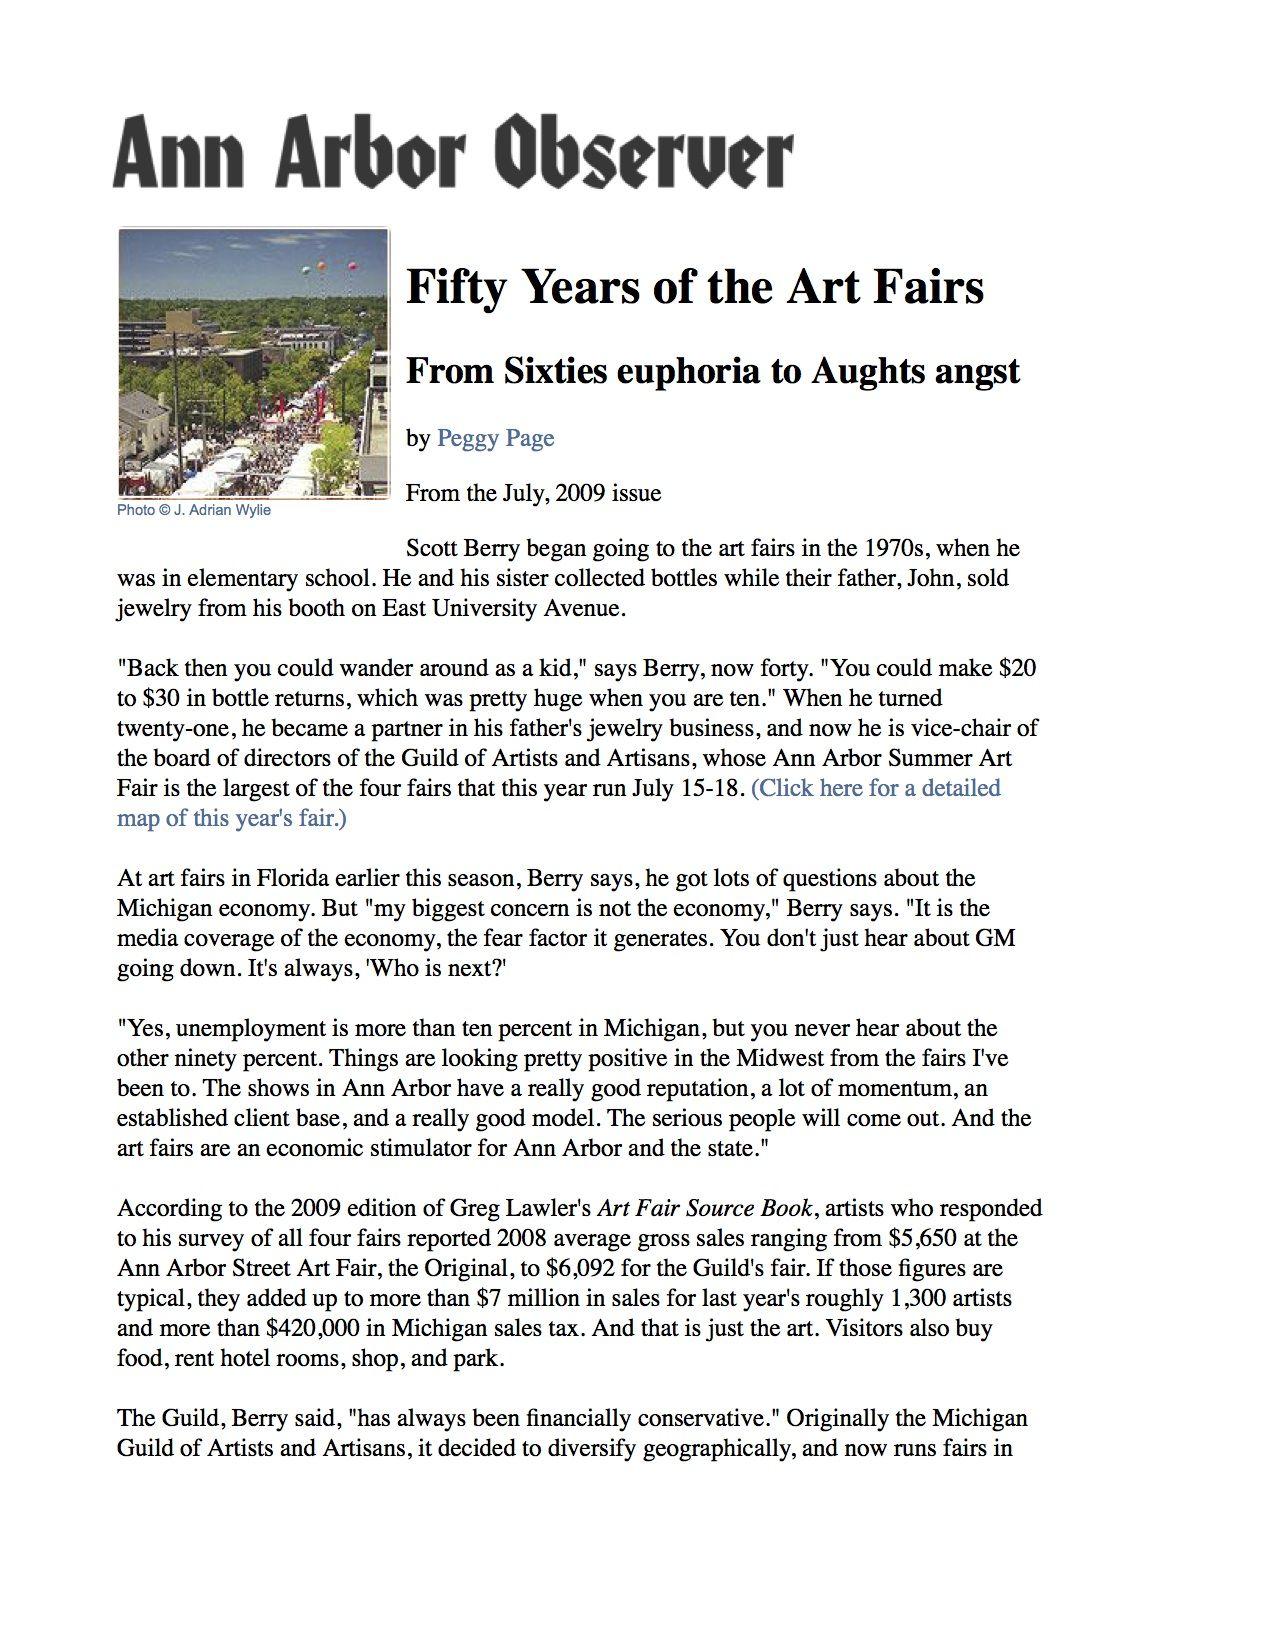 Fifty Years of the Art Fairs - Ann Arbor Observer